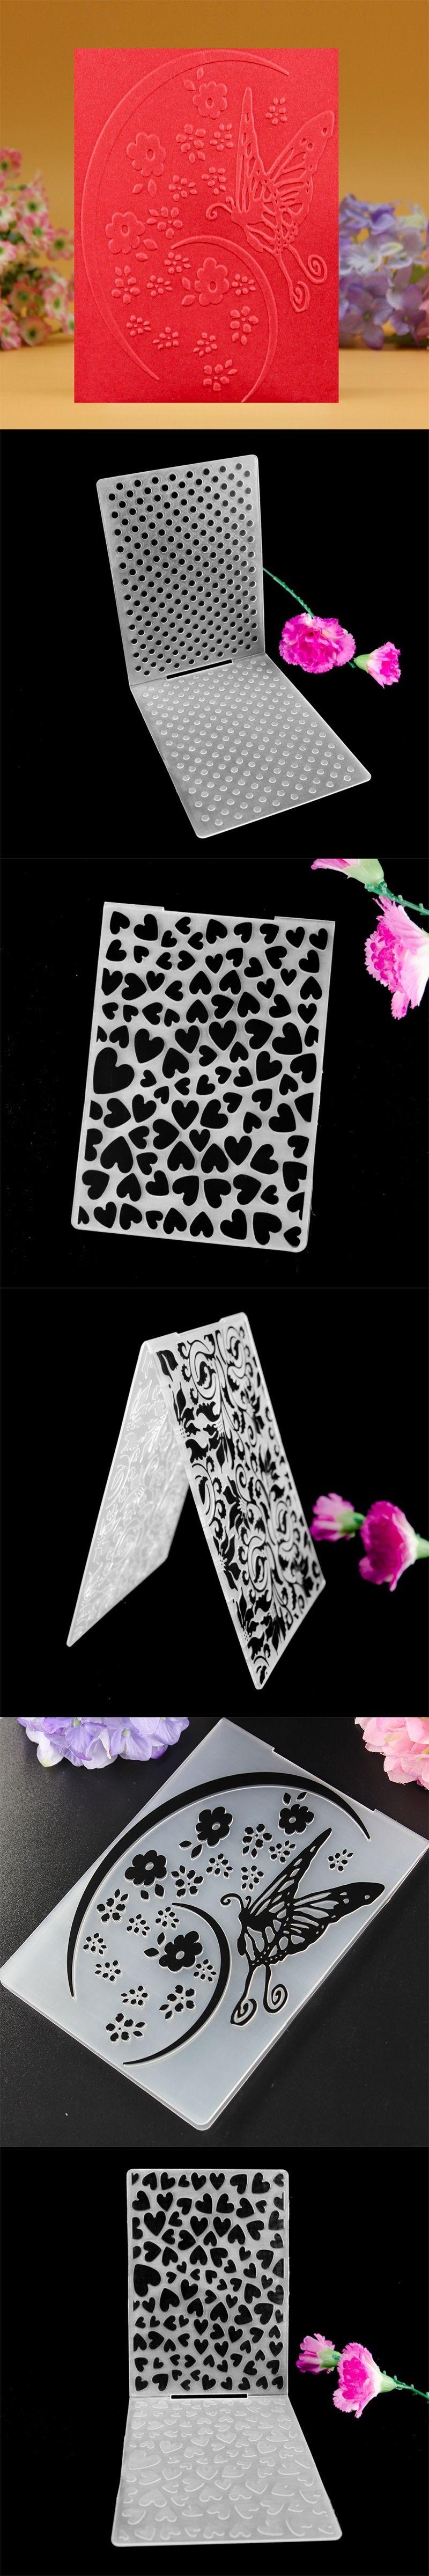 DIY Scrapbooking Card Making Plastic Embossing Folder Flower ...